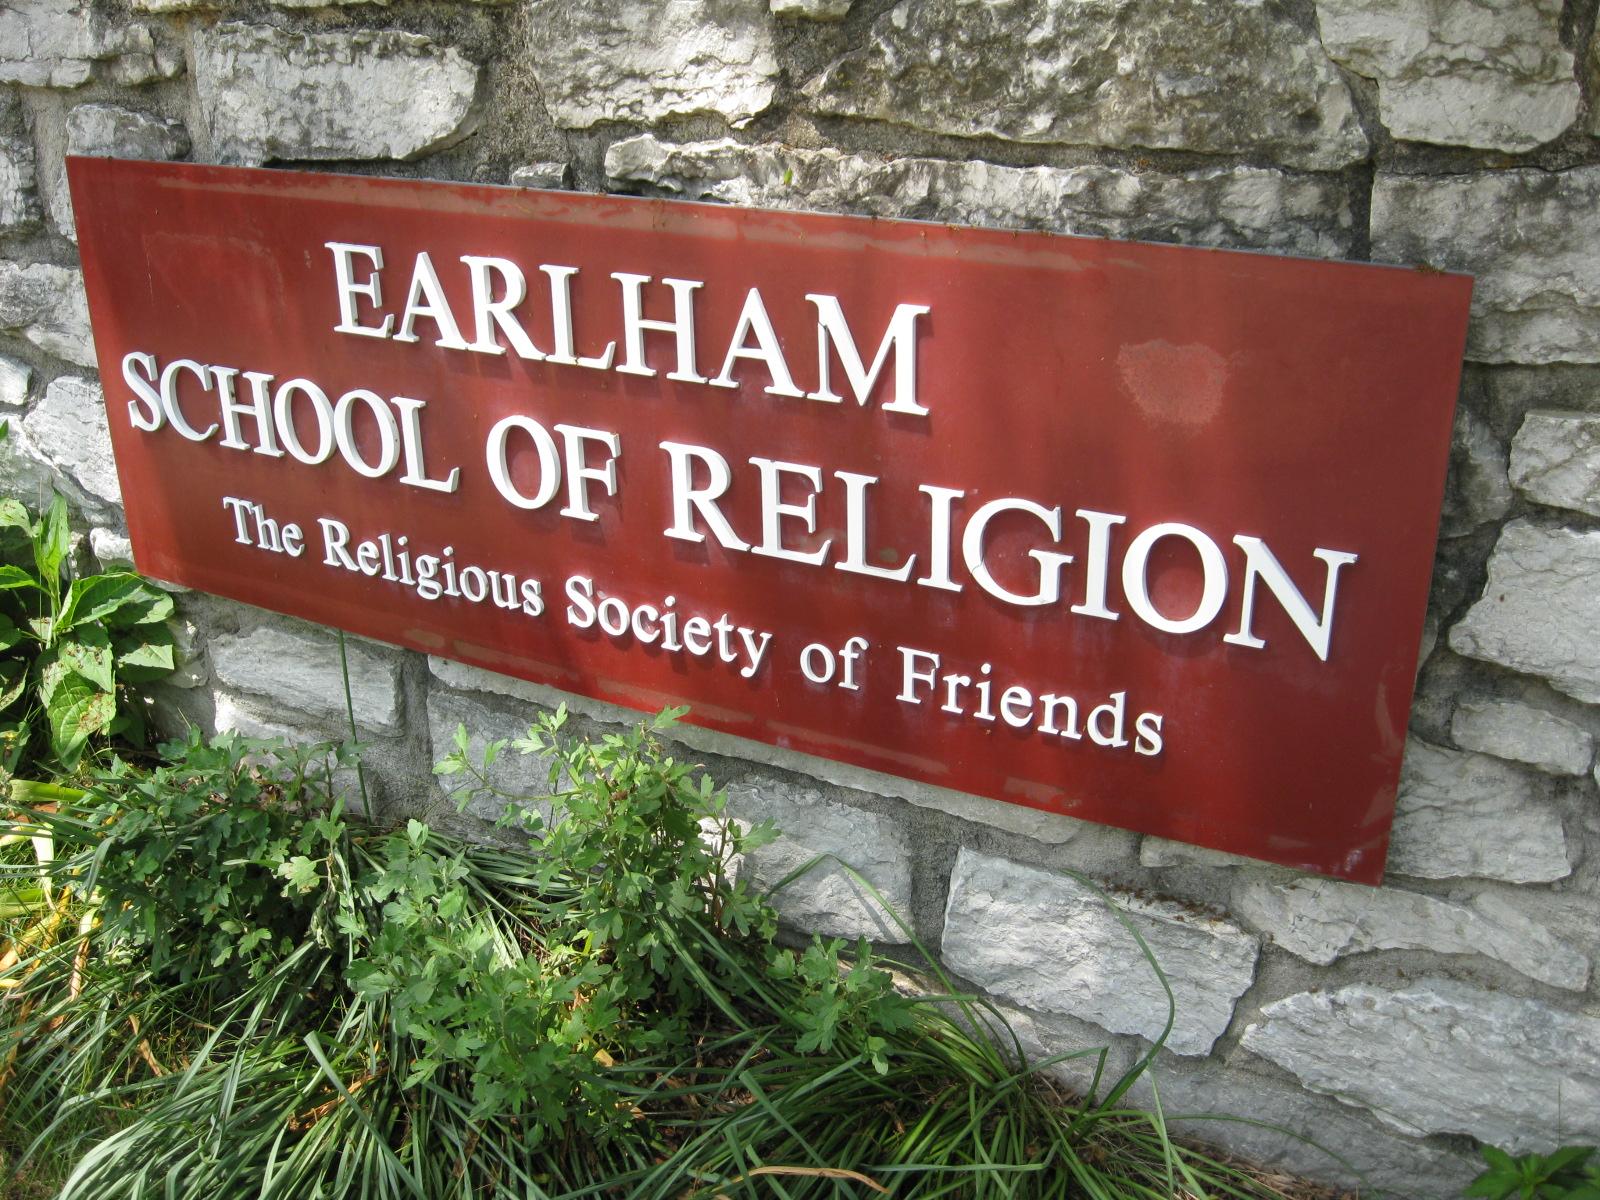 9%2f9c%2fearlham school of religion sign